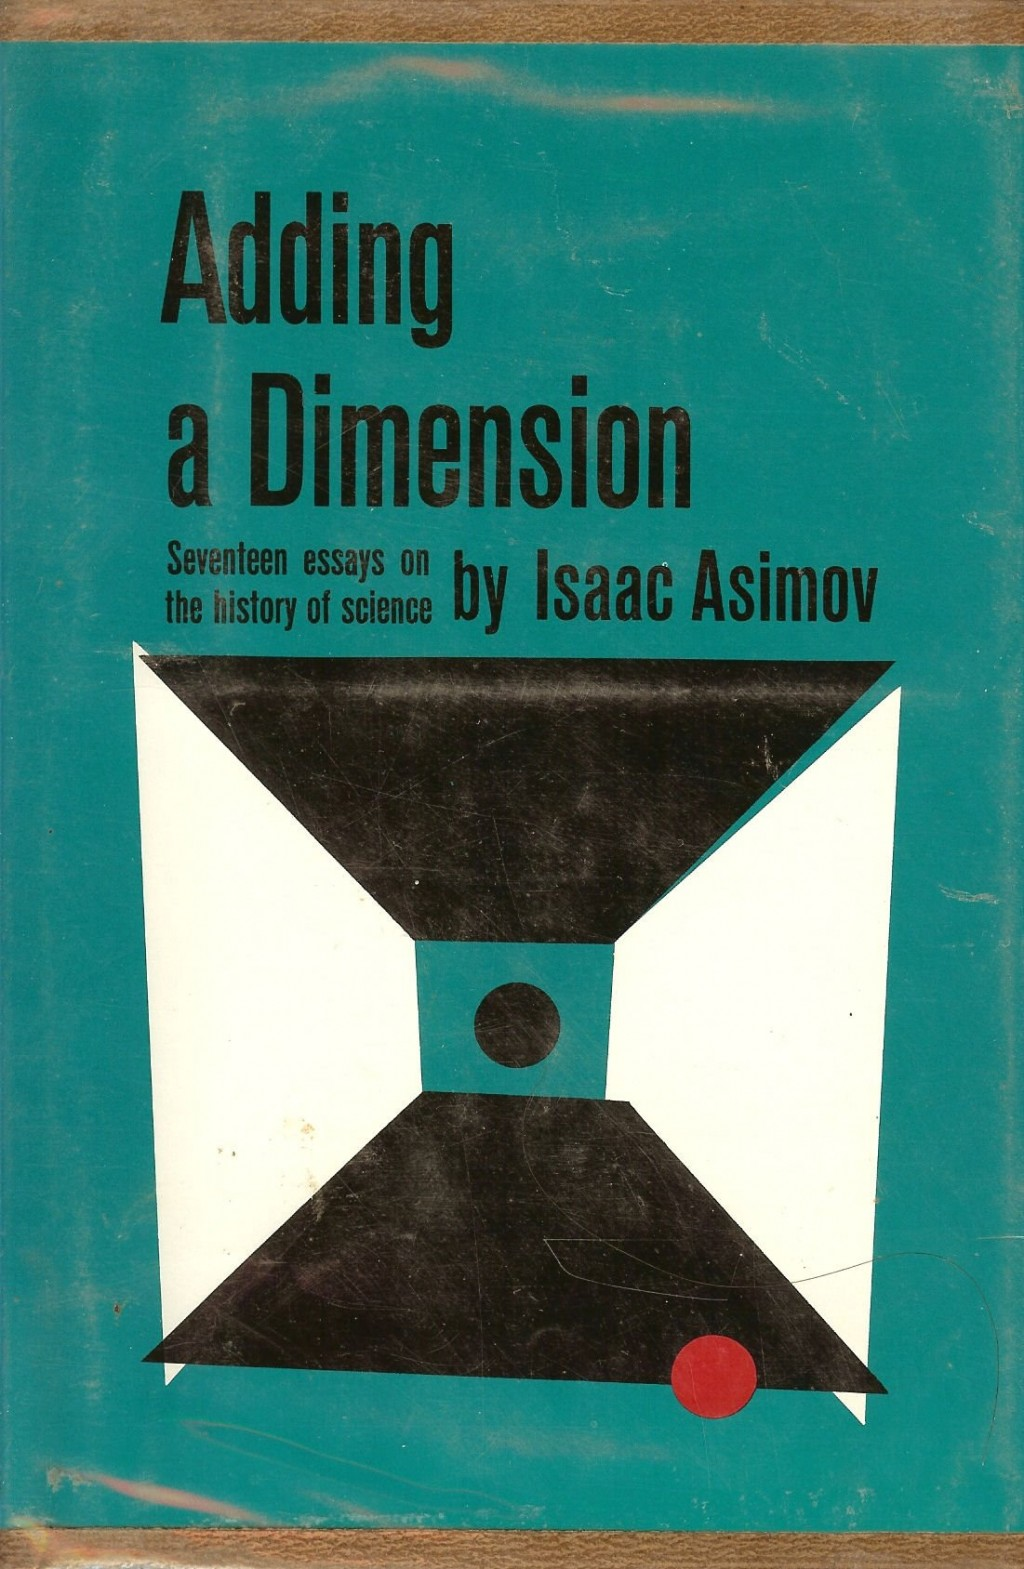 003 Essay Example 810n2jdah2bl Isaac Asimov Awful Essays On Creativity Intelligence Large